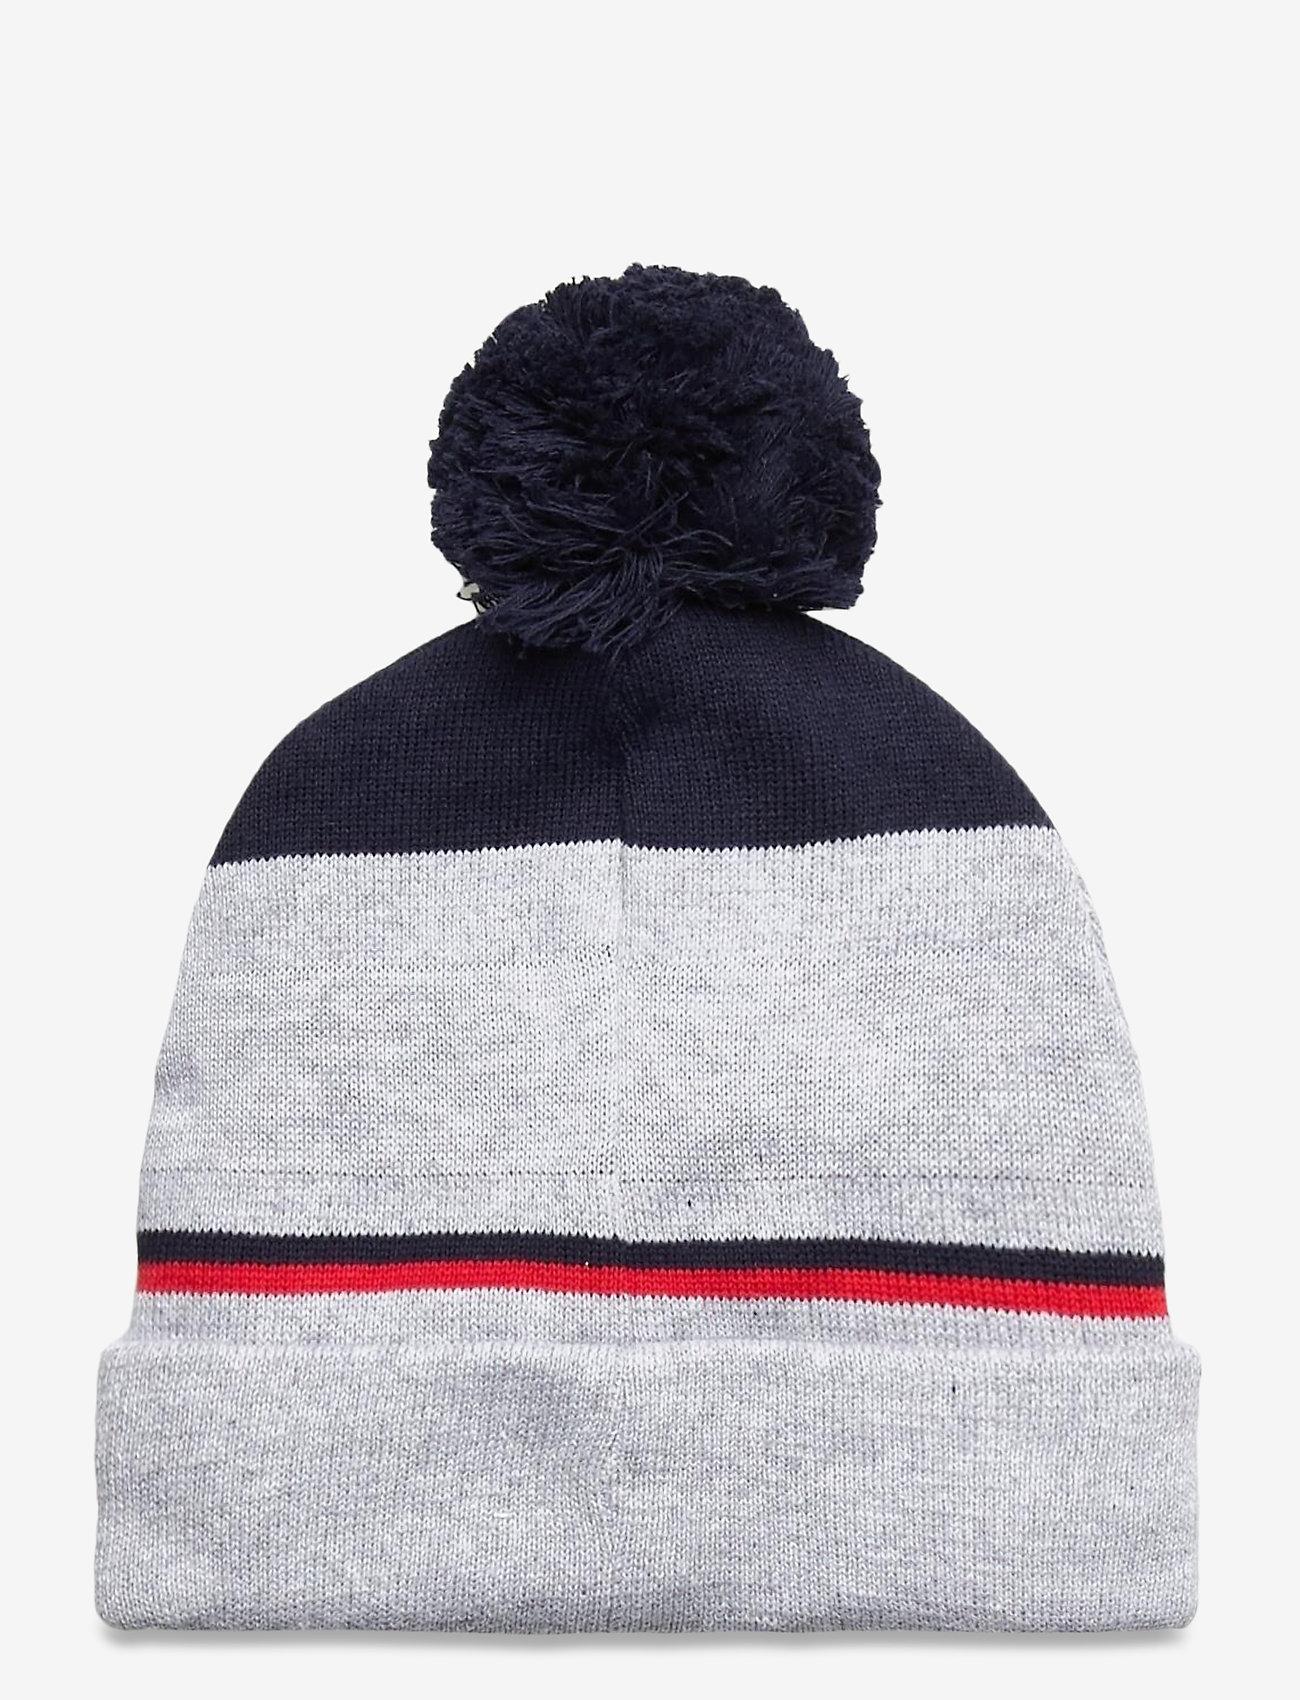 Kenzo - PULL ON HAT - huer - grey marl - 1